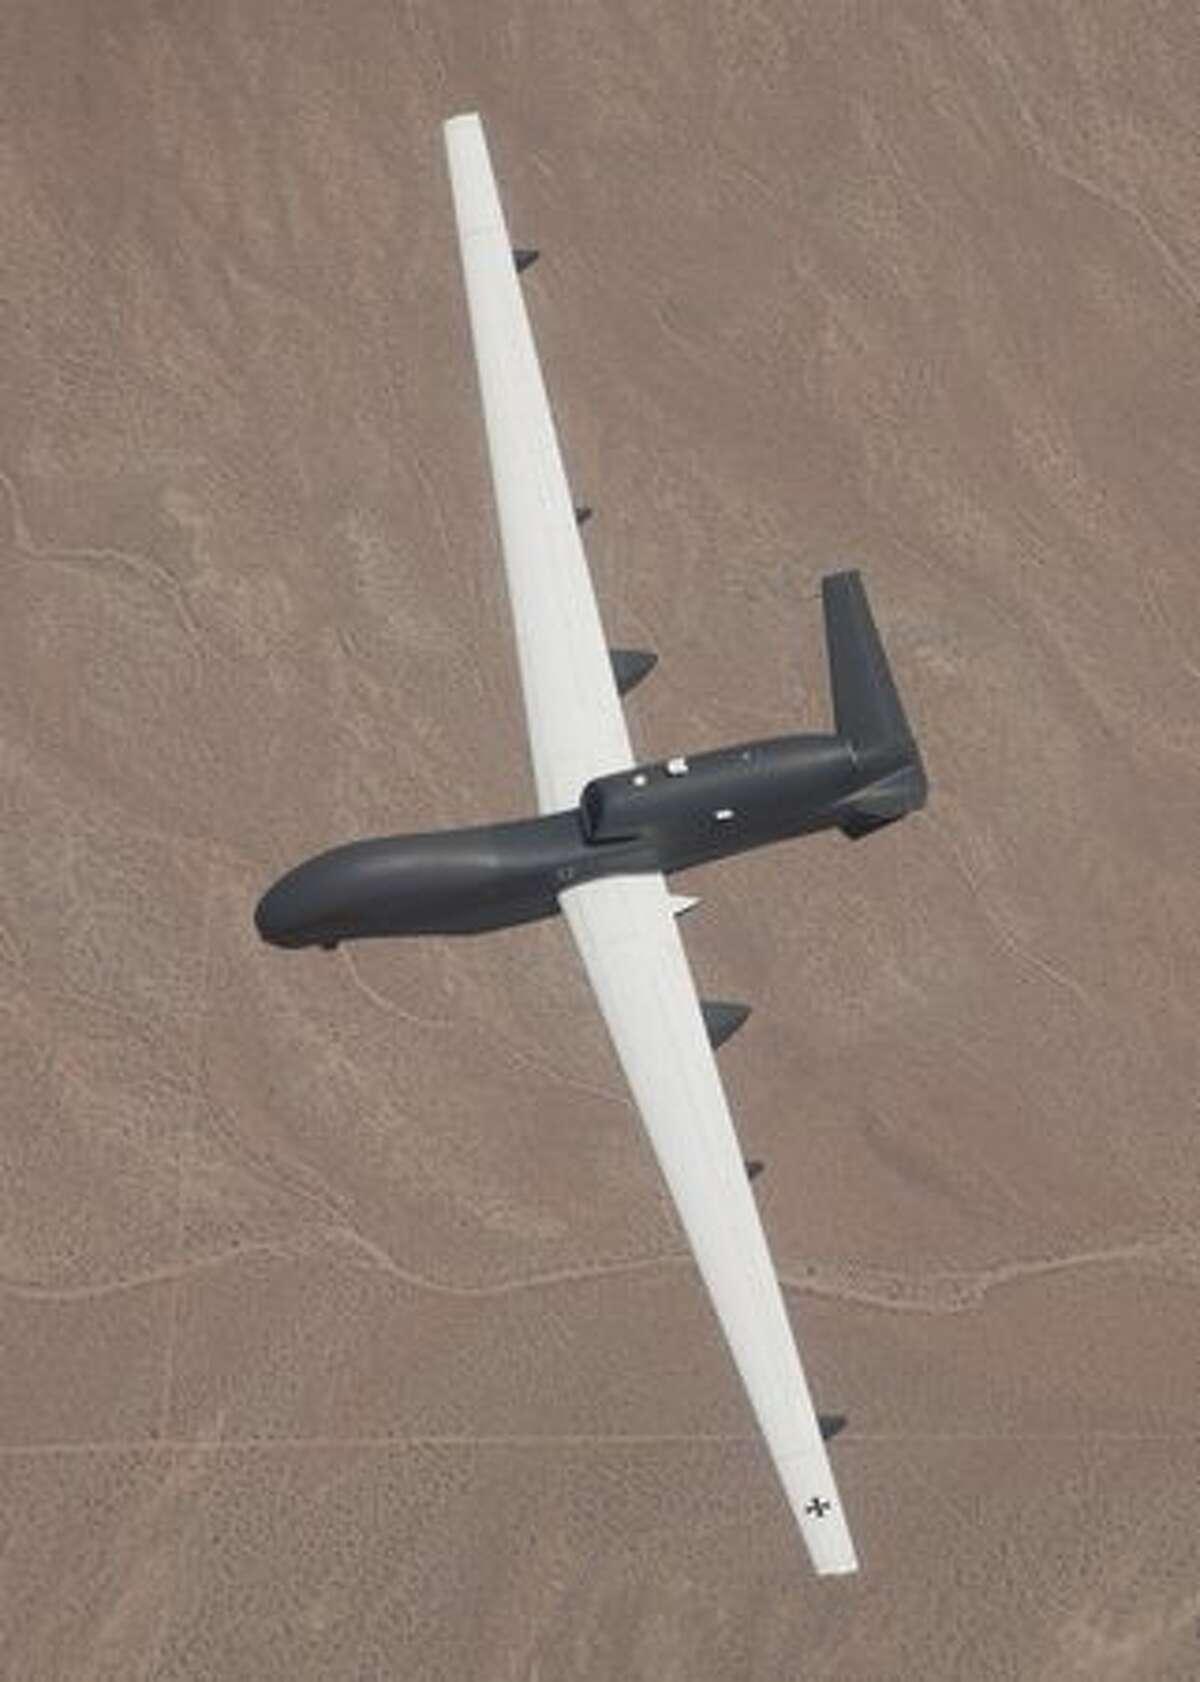 The Euro Hawk unmanned reconnaissance aircraft on its maiden flight from Northrop Grumman's Palmdale, Calif., manufacturing plant. (Northrop Grumman)